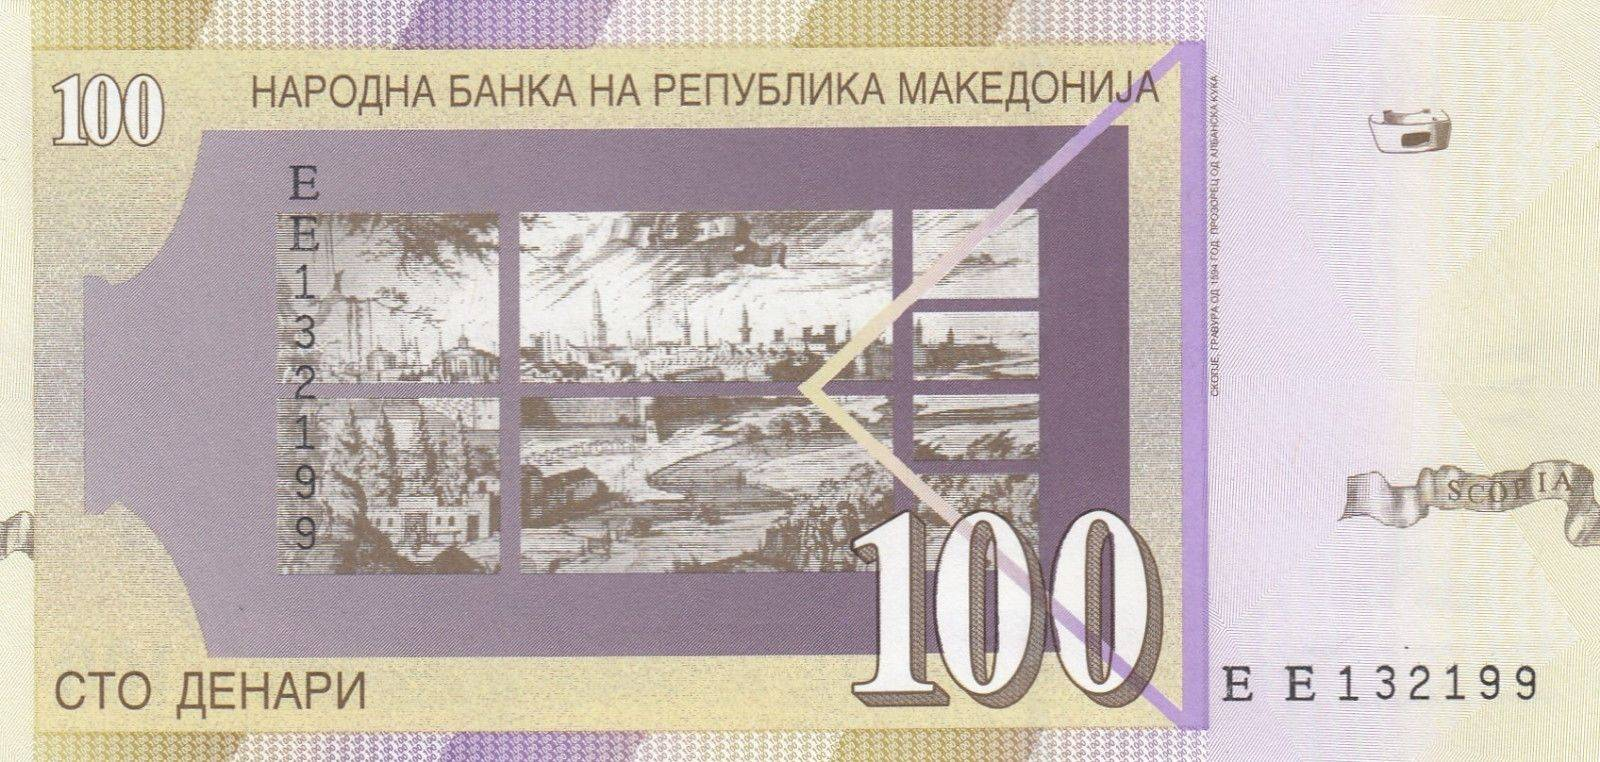 2007 Macedonia 100 Denari p16g UNC